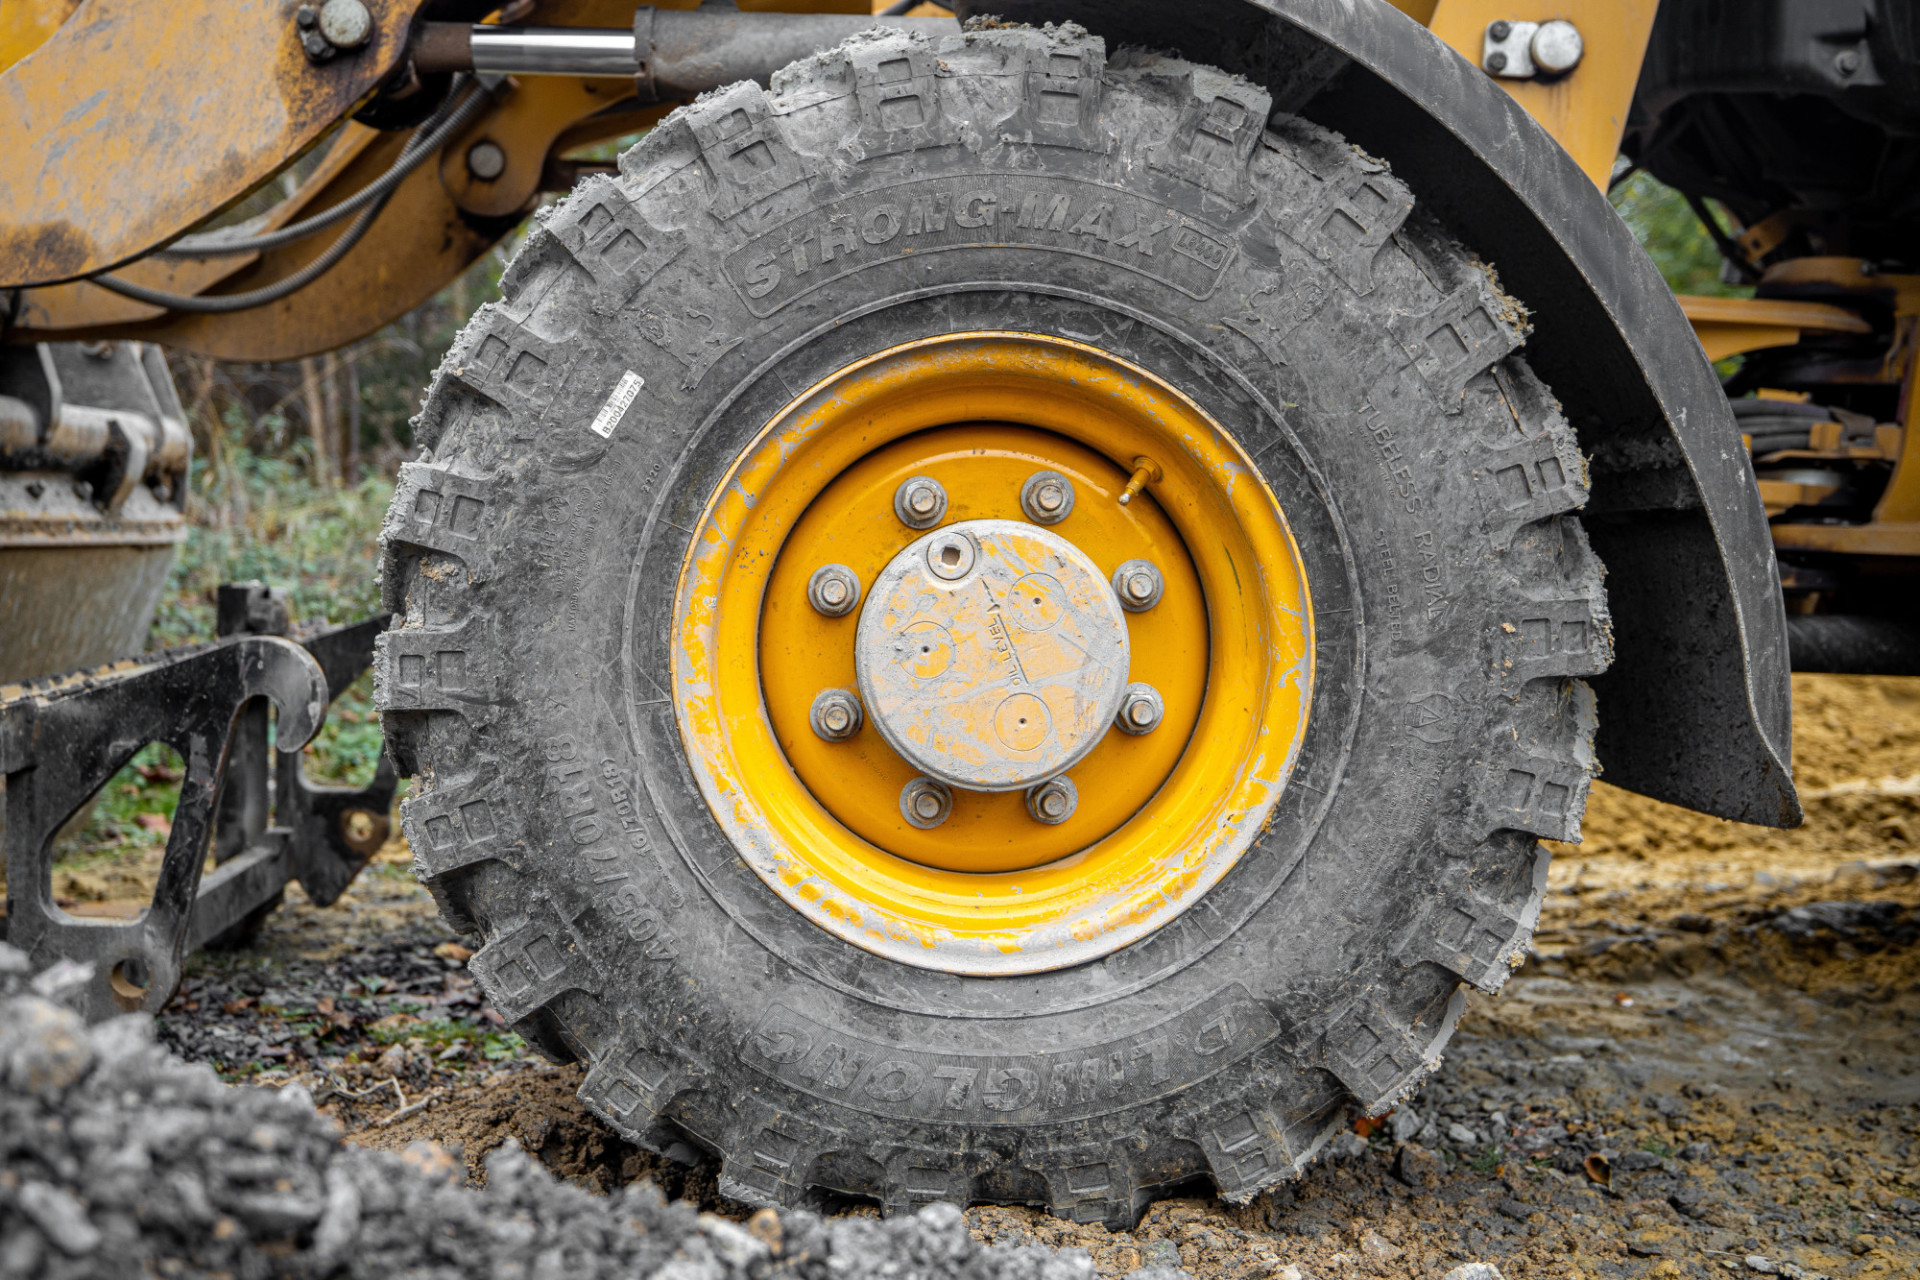 Excavator tires